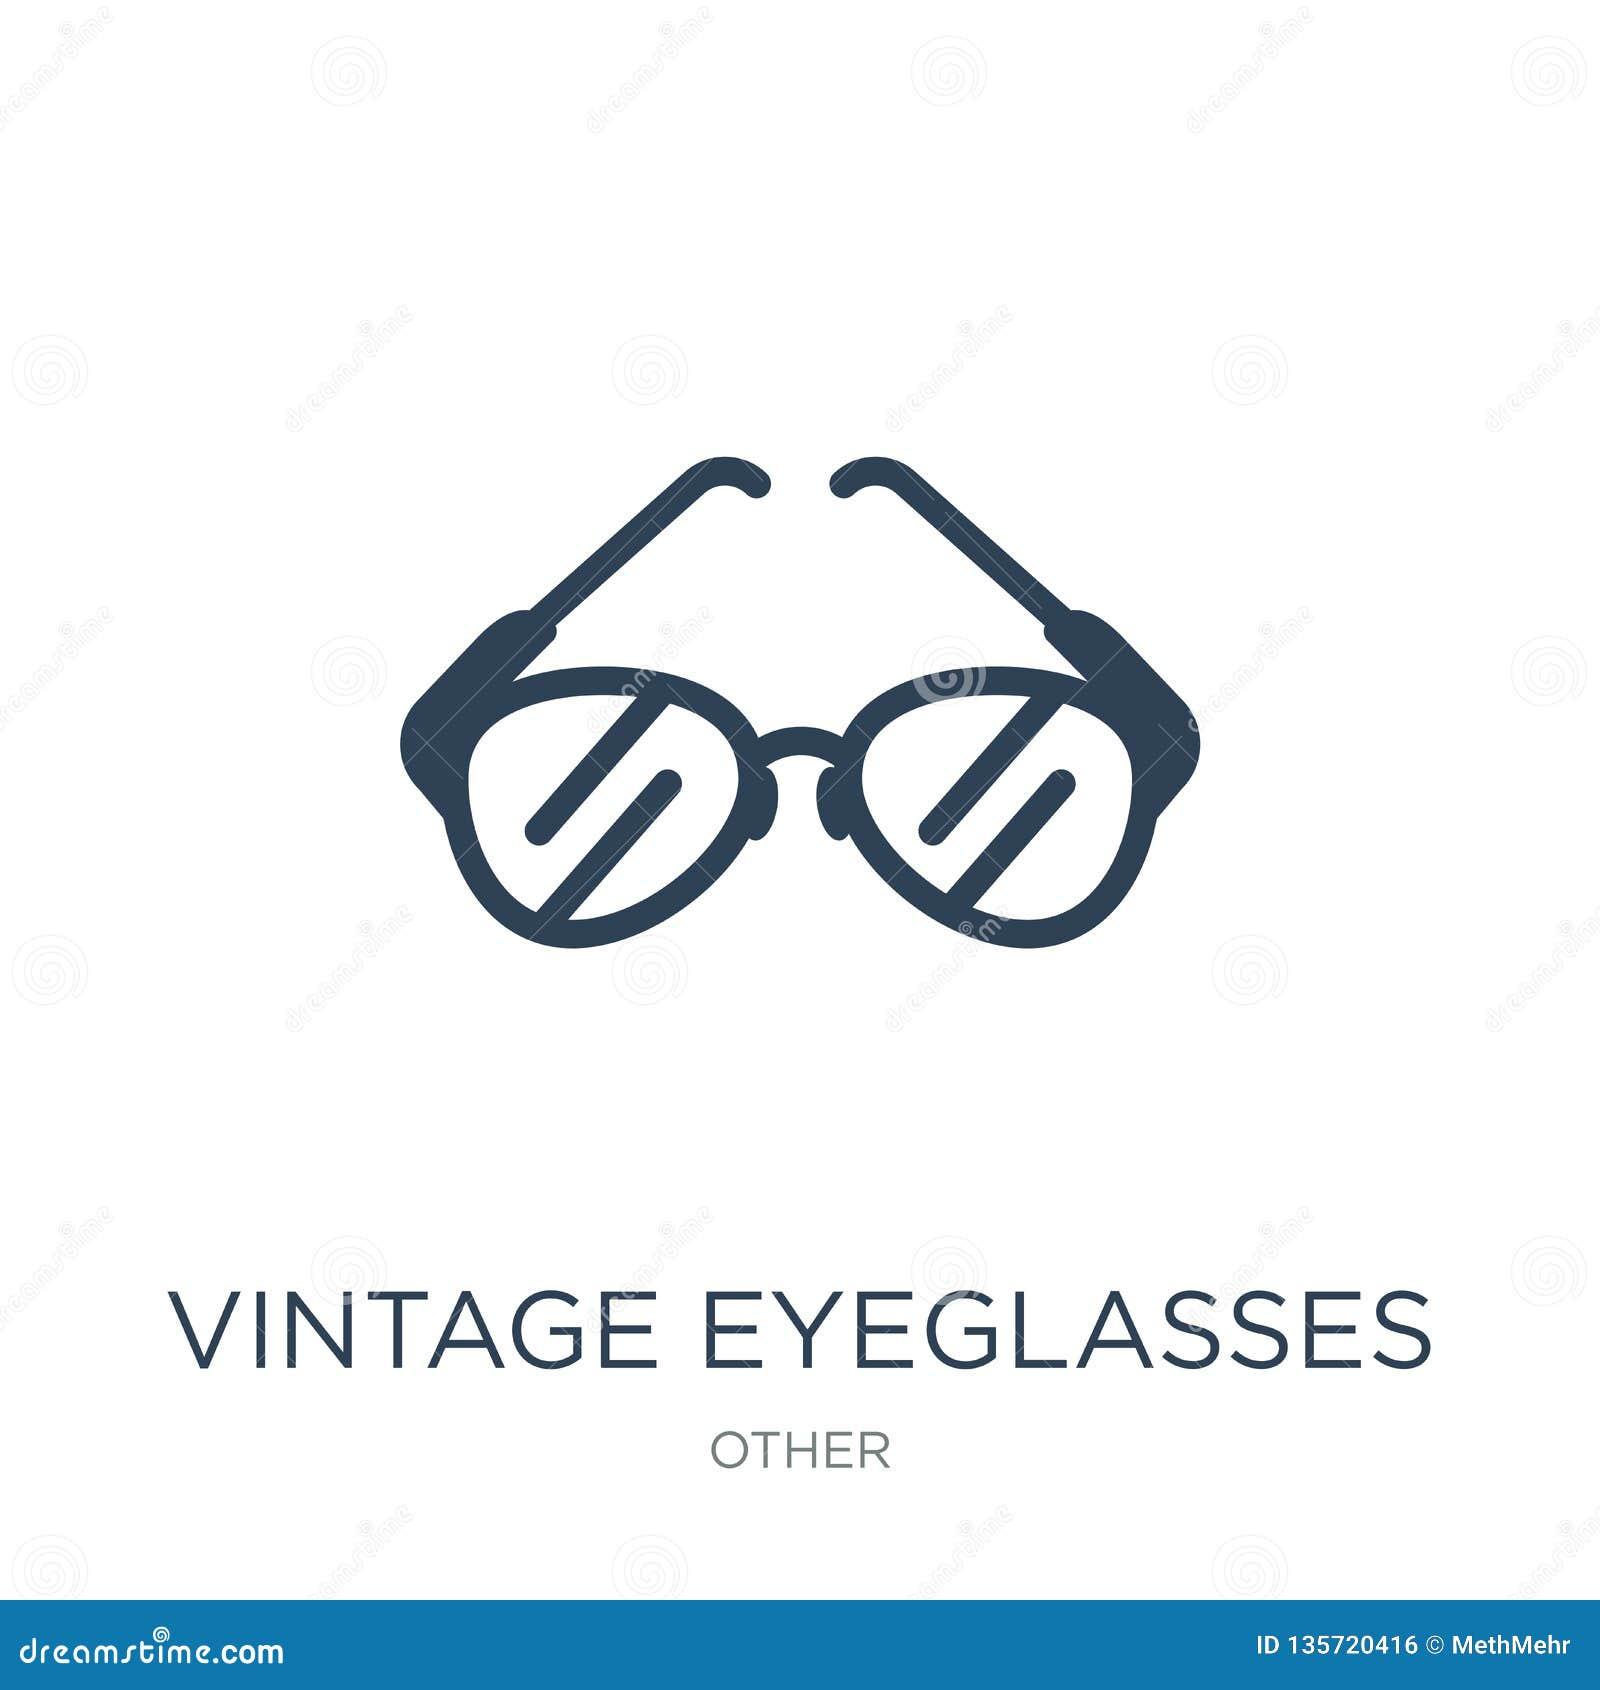 5204d37844c Royalty-Free Vector. vintage eyeglasses icon in trendy design style. vintage  eyeglasses icon isolated on white background.